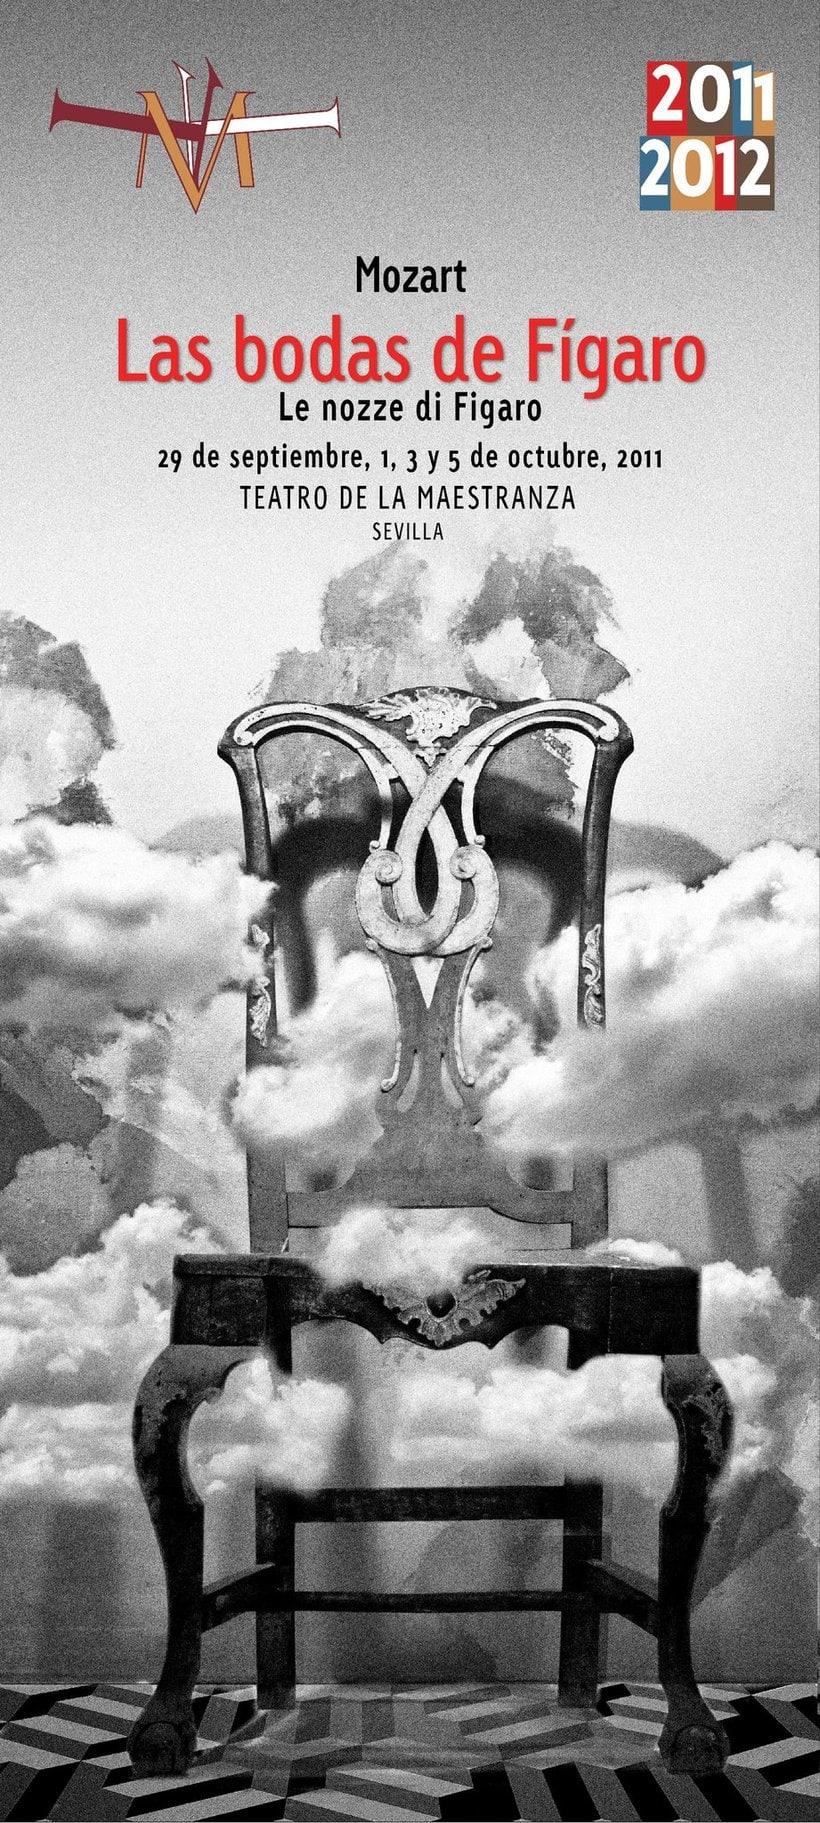 Óperas / Temporada 2011 / 2012 / Teatro de la Maestranza. Sevilla 3